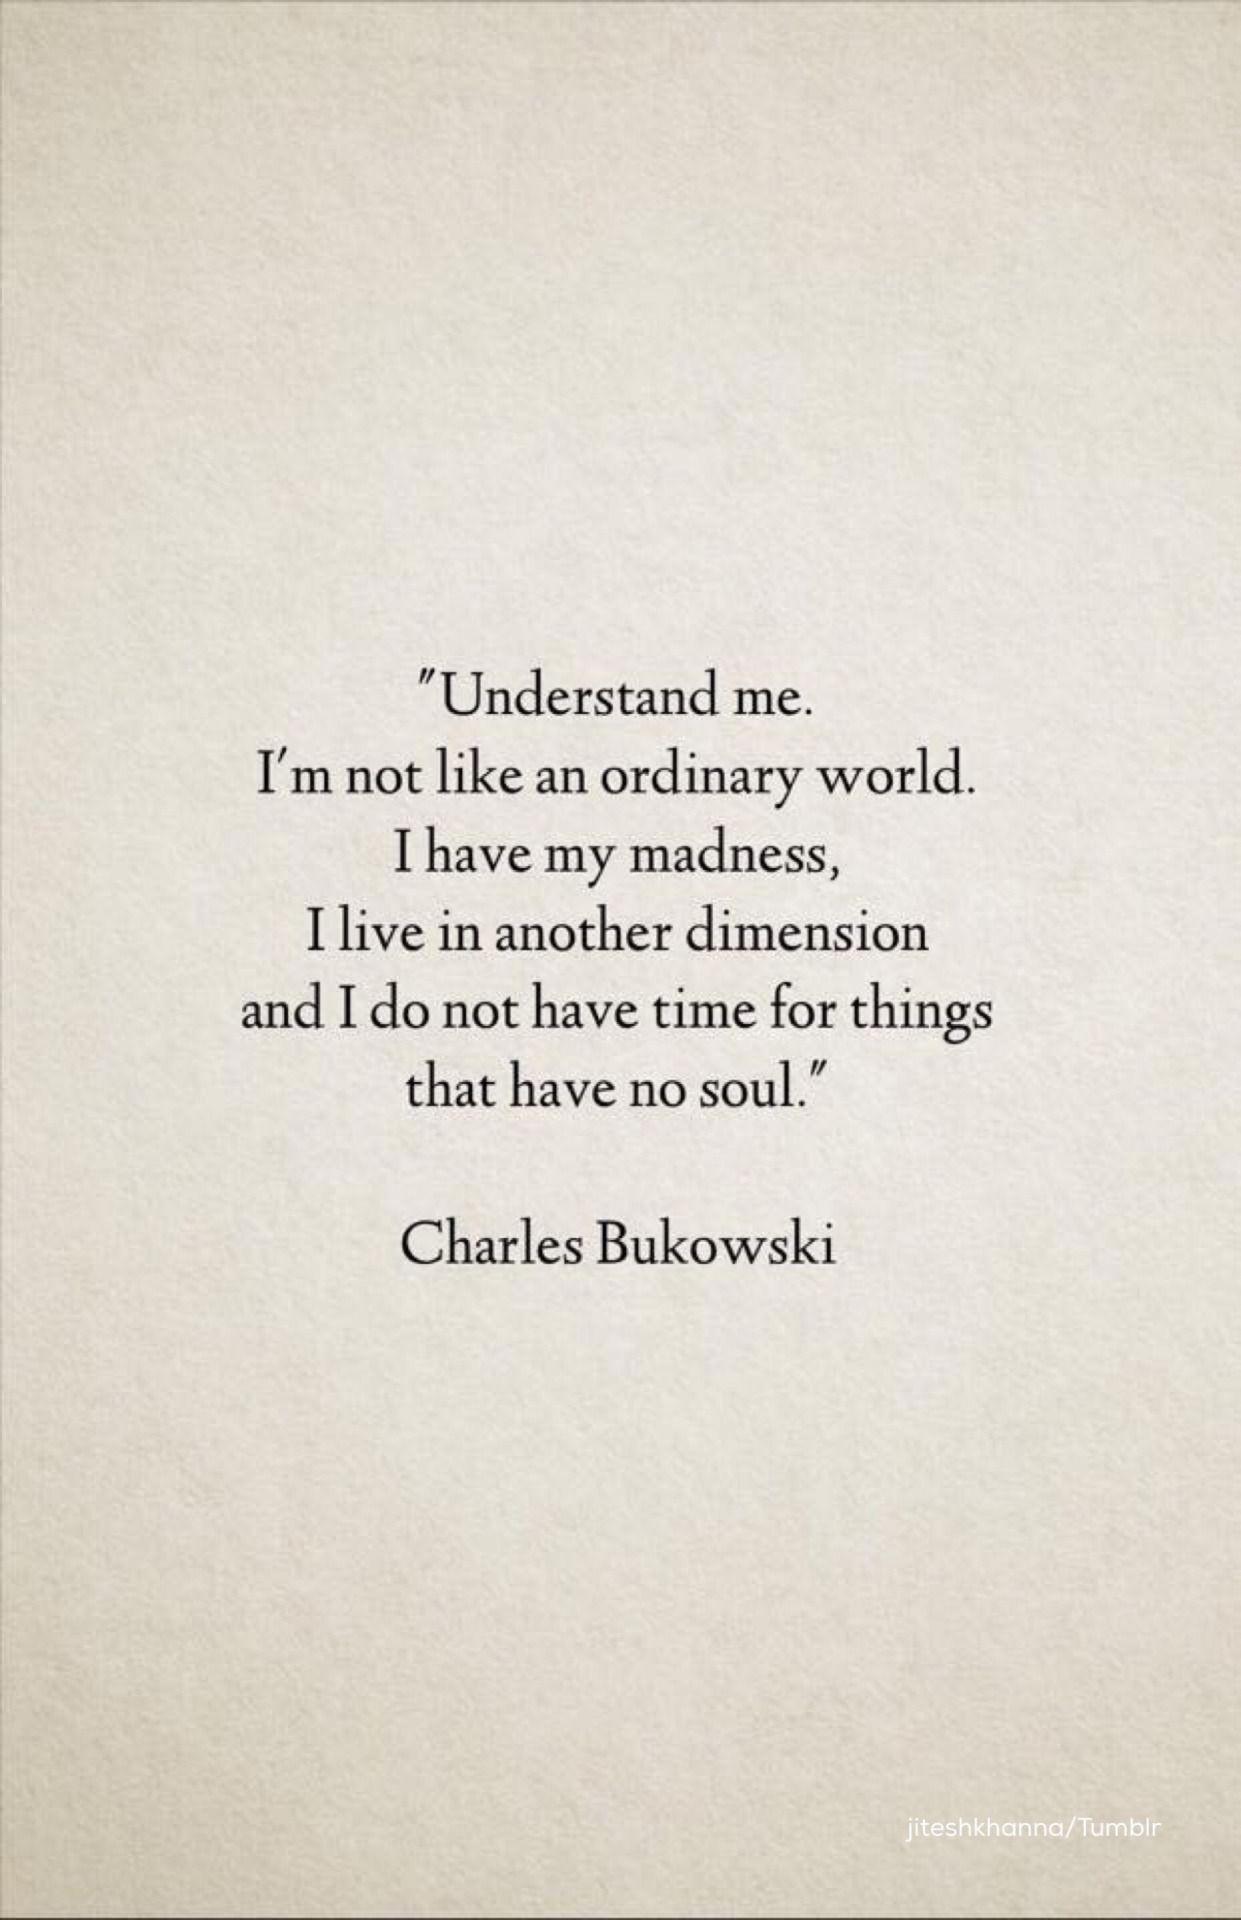 Charles Bukowski Quotes Piniida Valin On Inspiration  Pinterest  Amazing Words